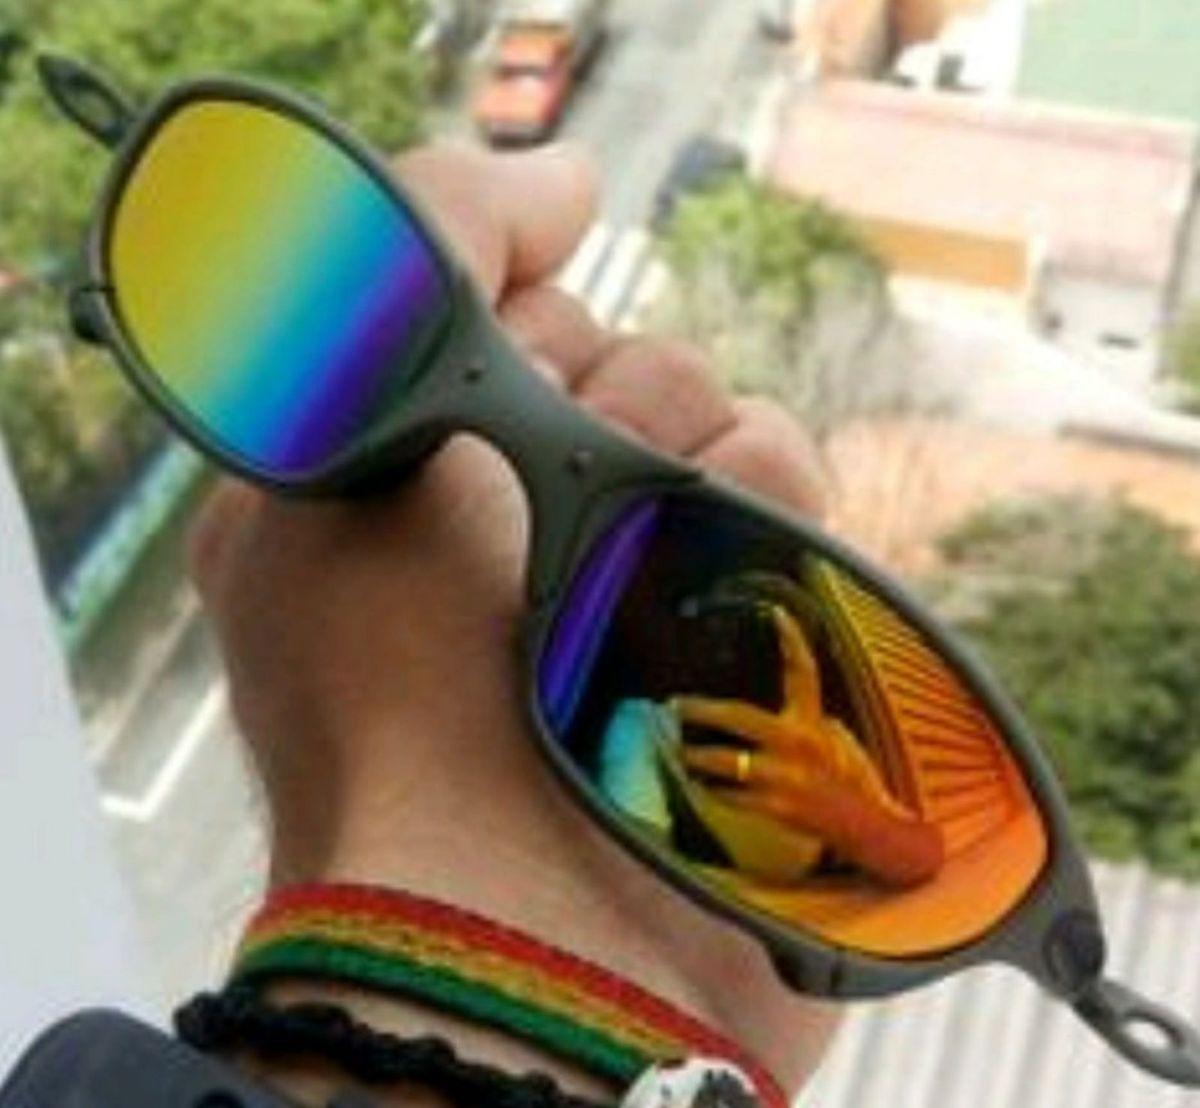 oculos juliet arco íris - óculos oakley.  Czm6ly9wag90b3muzw5qb2vplmnvbs5ici9wcm9kdwn0cy85mdqzndewl2m0ytvhmzzin2rmmmixnjyxy2rjmmixmdg2nmu3ywqylmpwzw  ... b8bdedf3798